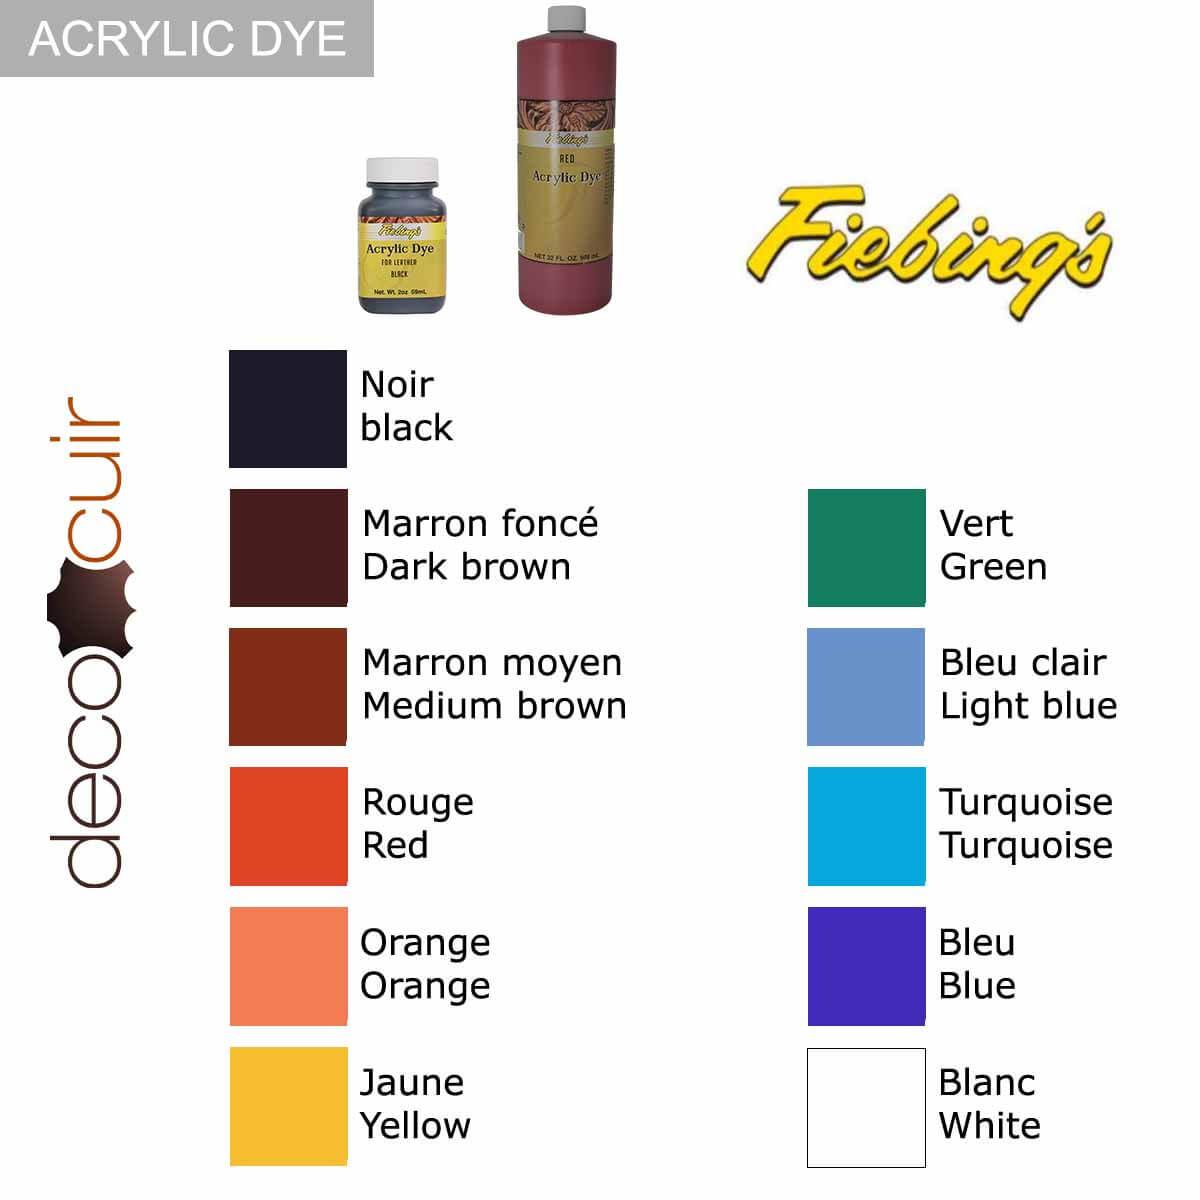 Peinture opaque - Fiebing's Acrylic Dye - JAUNE / YELLOW - 59ml